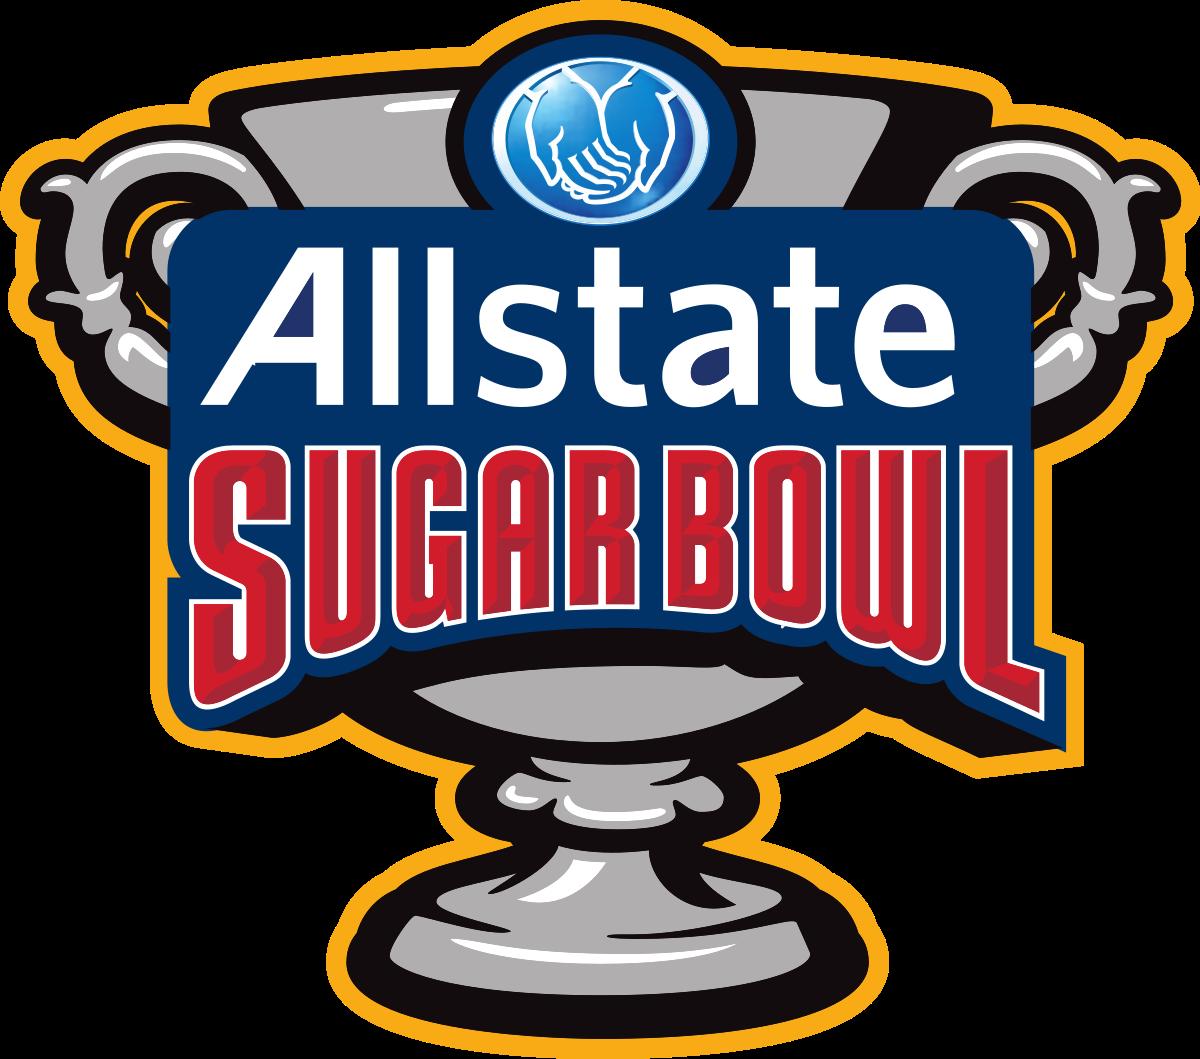 Georgia vs auburn football clipart vector royalty free download Sugar Bowl - Wikipedia vector royalty free download